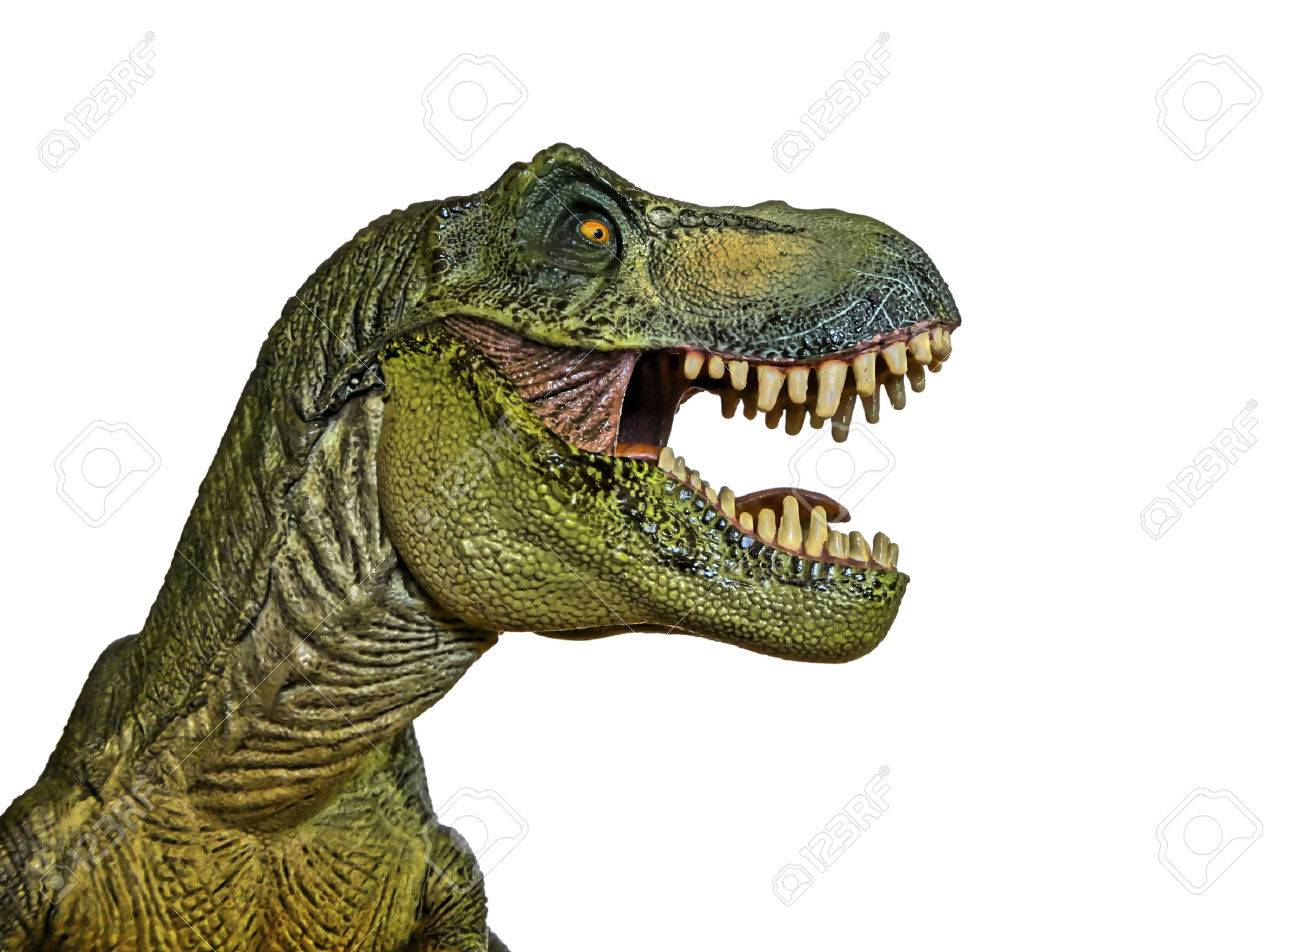 A Tyrannosaurus Rex Hunts Against a White Background - 30422659